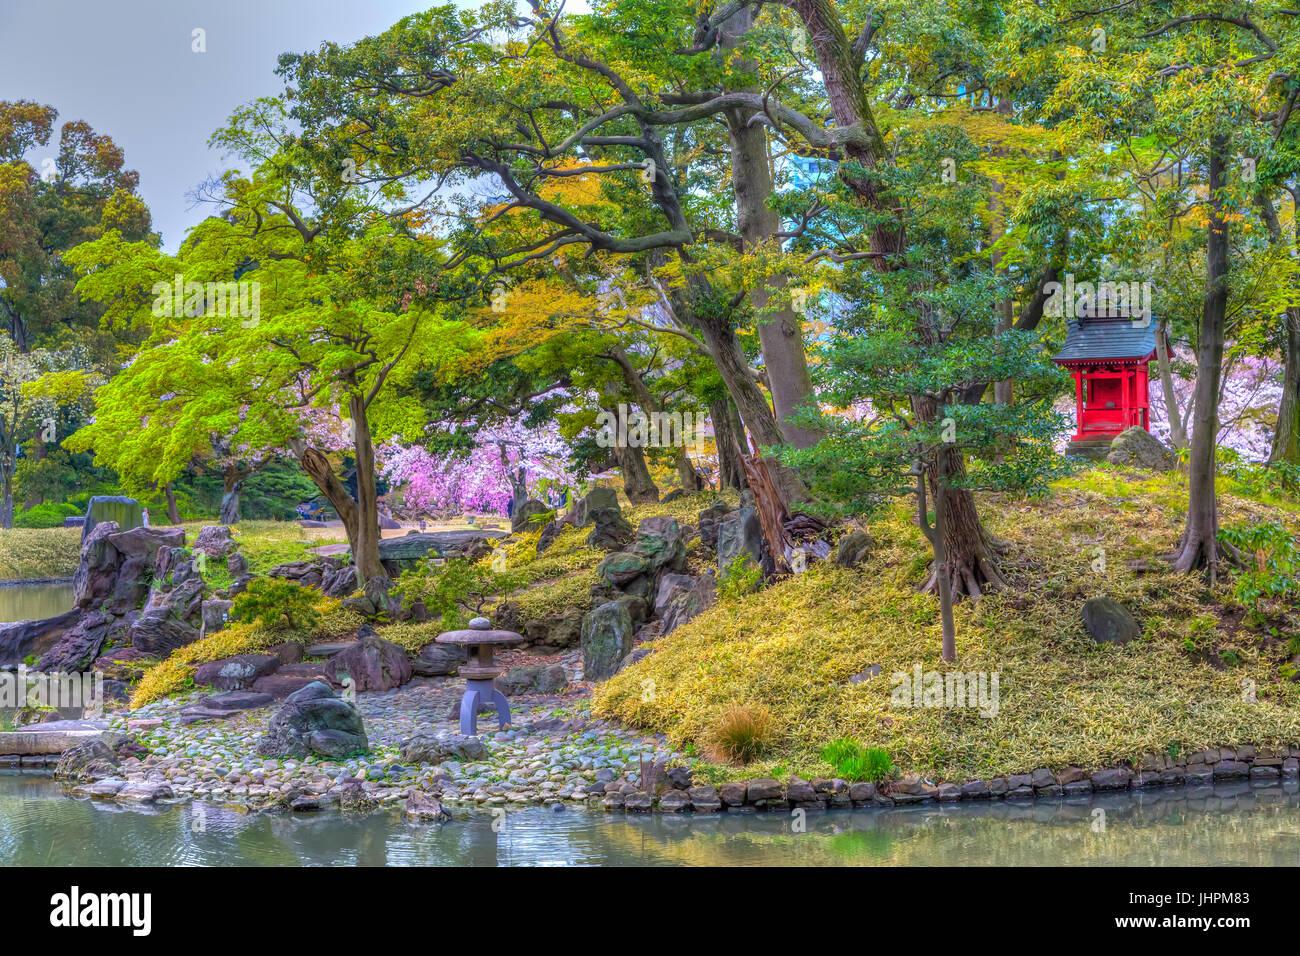 The Koishikawa Kōrakuen Gardens in Bunkyo, Tokyo, Japan. - Stock Image